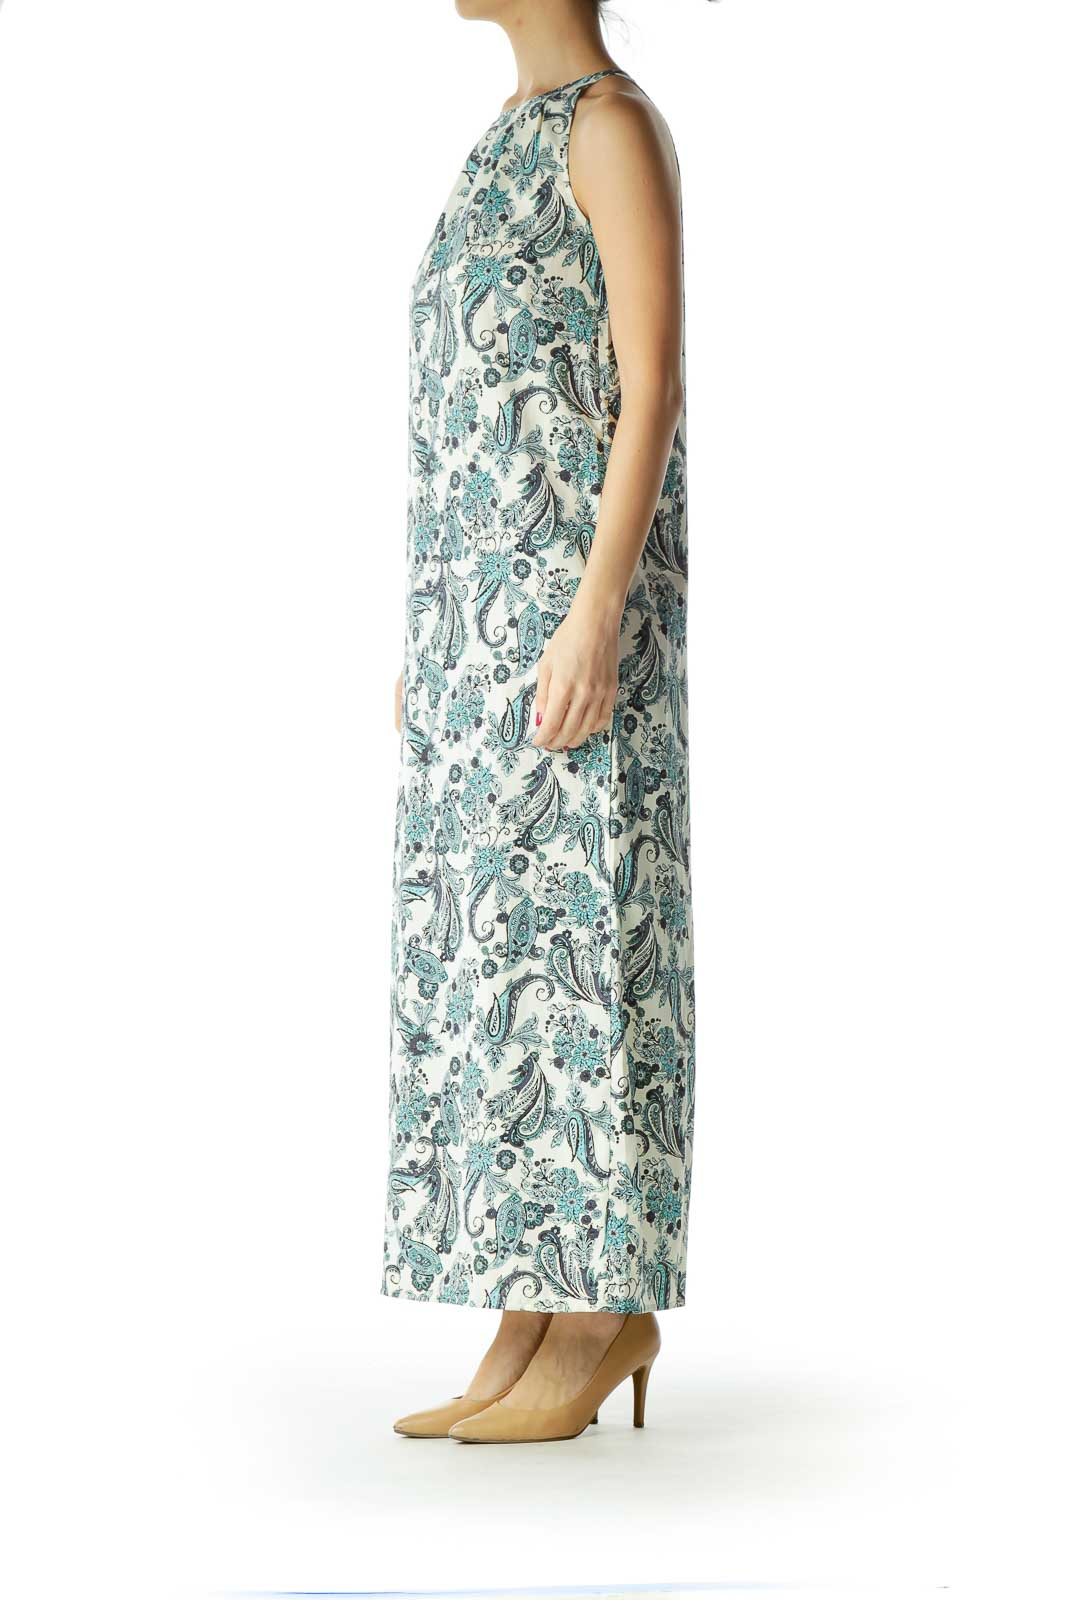 b169839ff8 Shop Blue Cream Print Maxi Dress clothing and handbags at SilkRoll ...